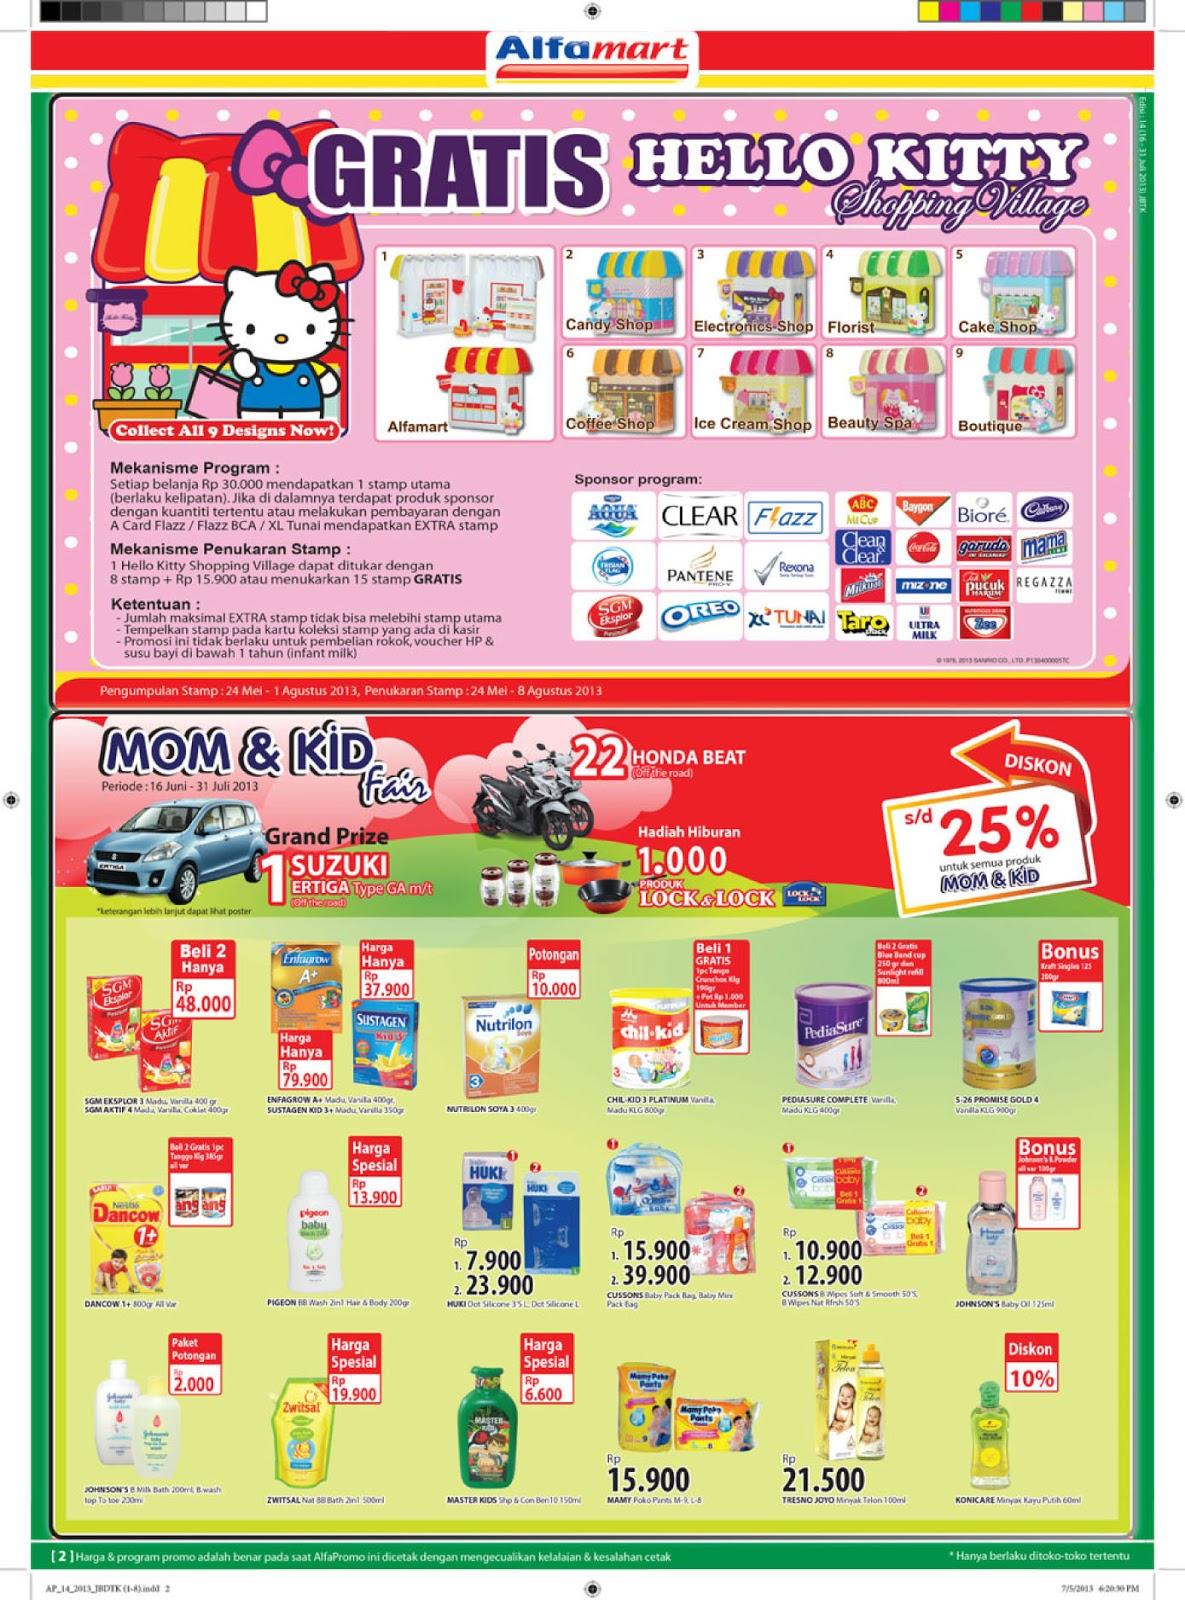 Image Result For Download Bokep Japan Via Hp